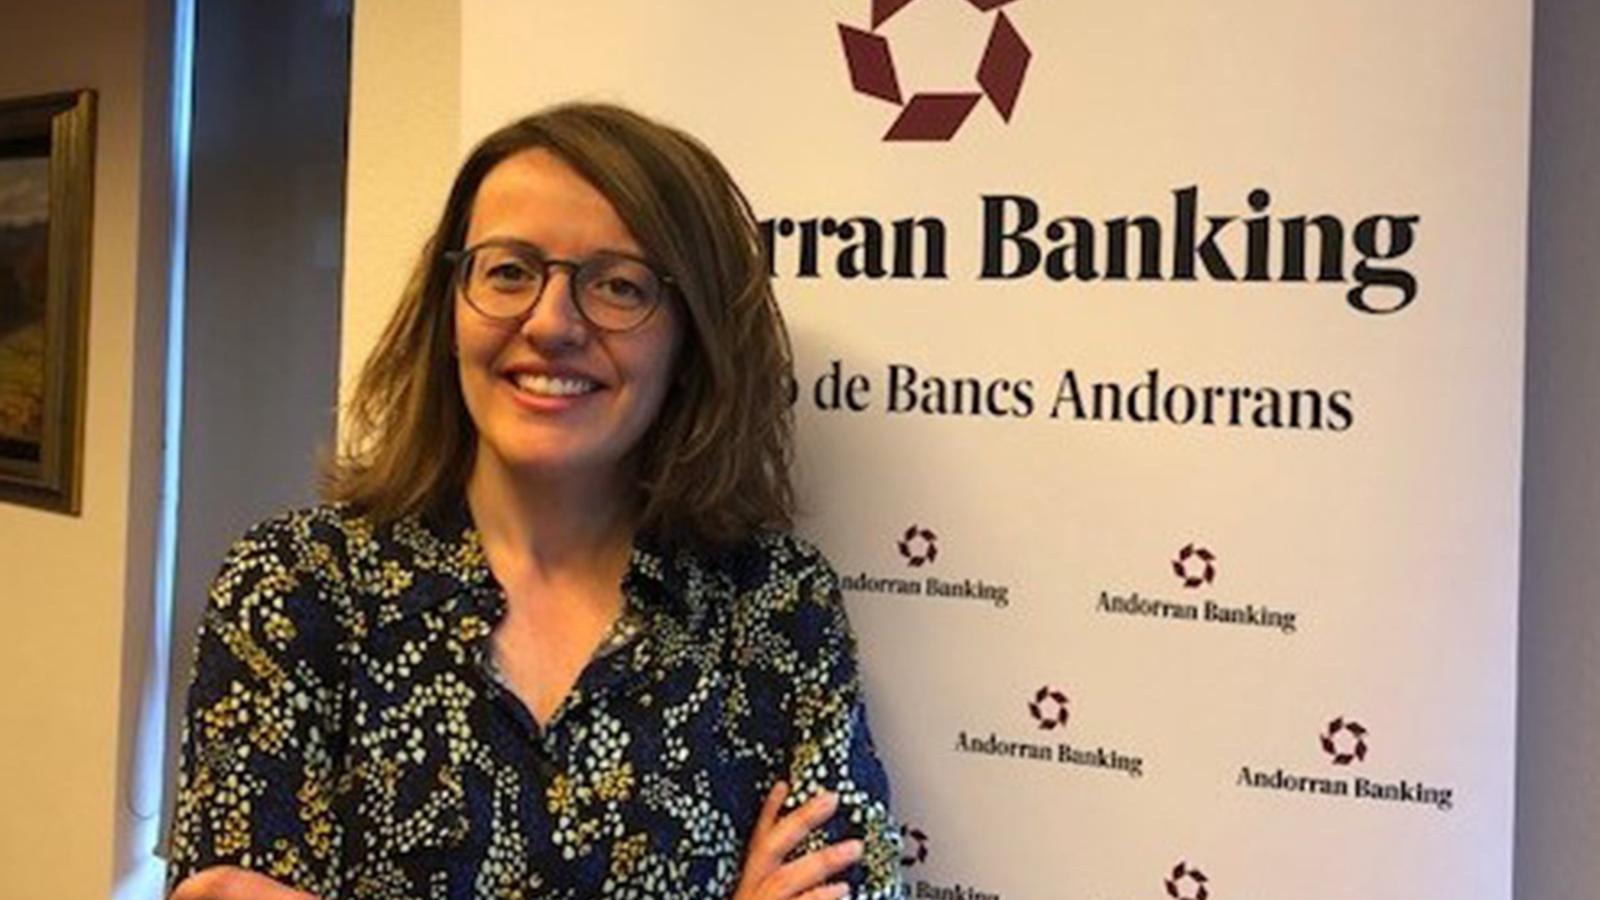 La directora general d'Andorran Banking, Esther Puigcercós. / ANDORRAN BANKING